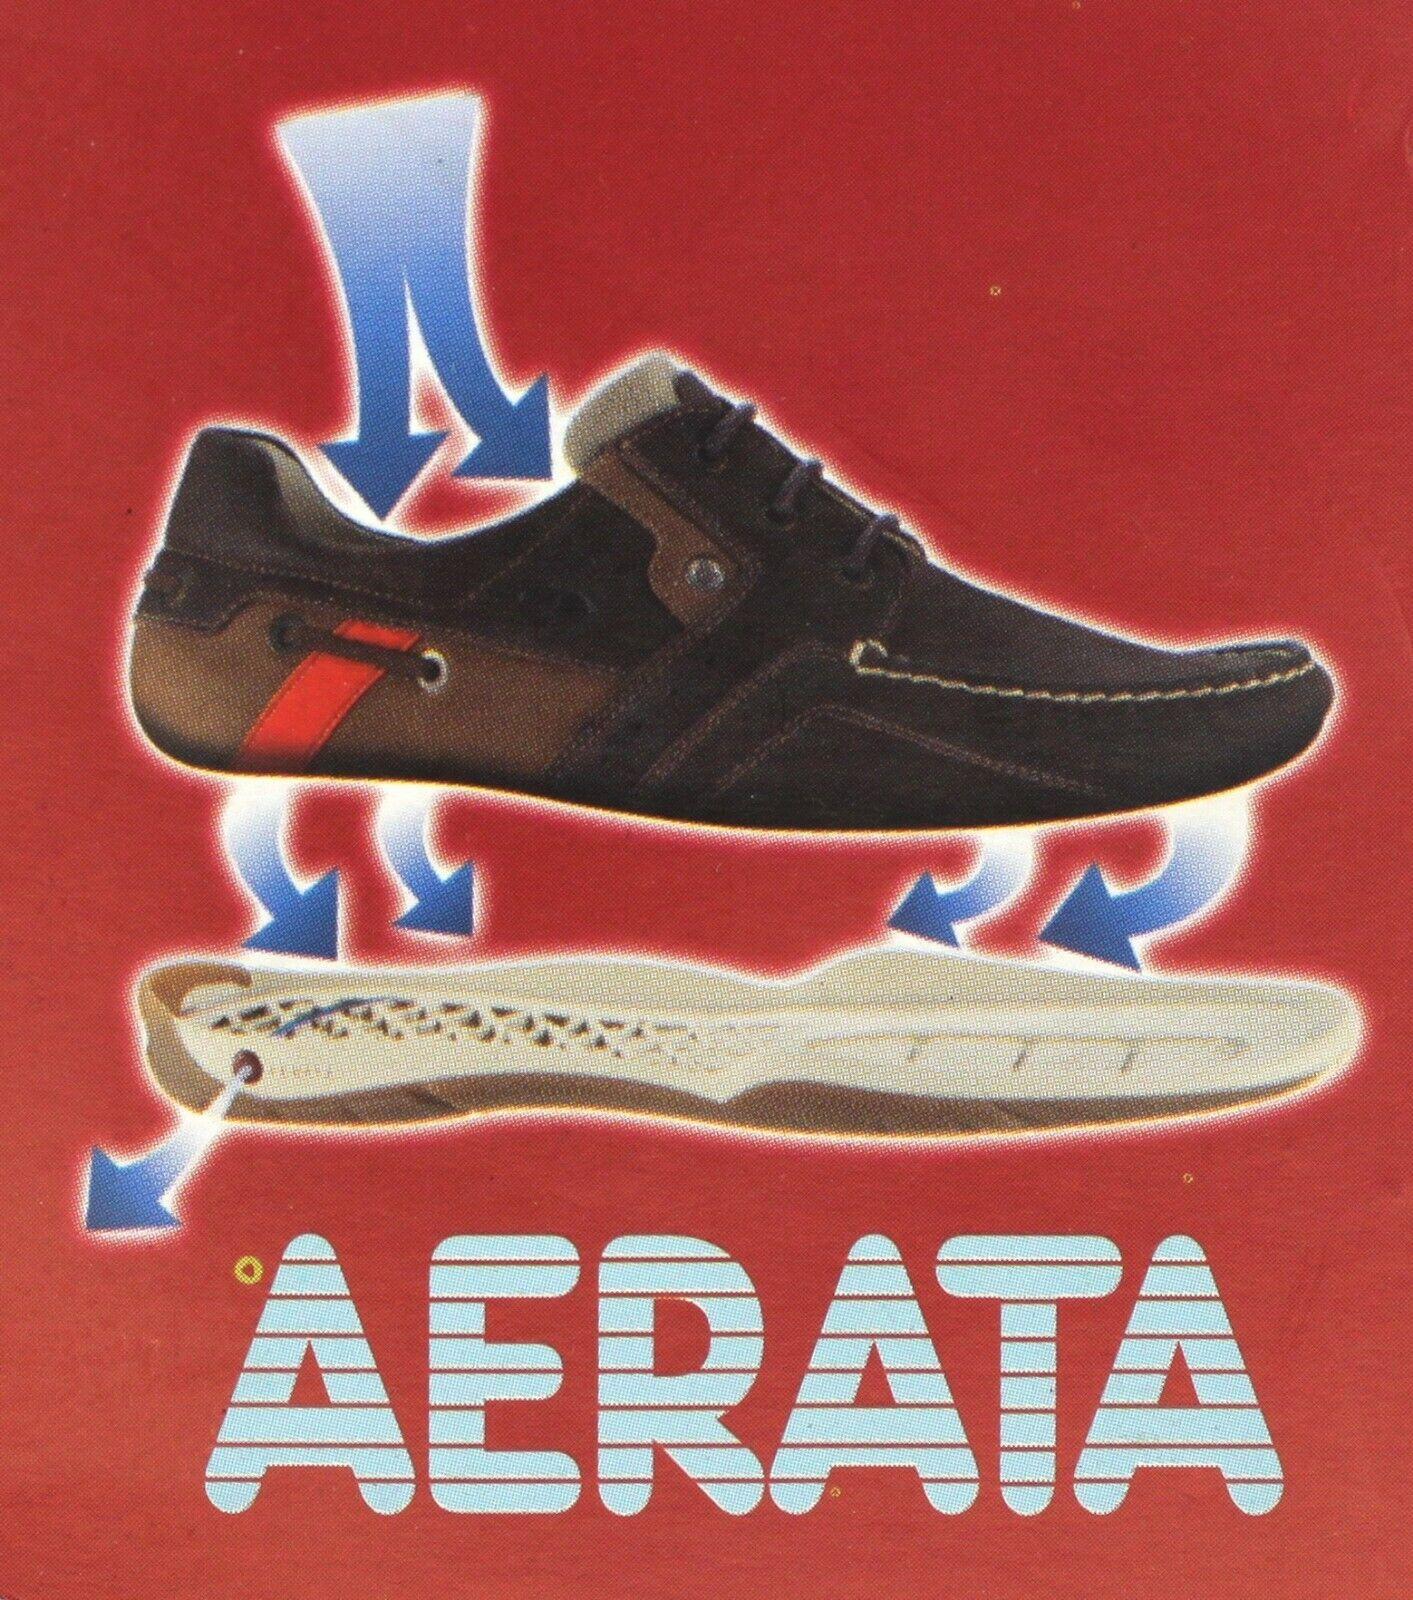 greyPORT AERATA shoes men CASUAL TENNIS TEMPO TEMPO TEMPO LIBERO PELLE NABUK blue n. 39 46f7db